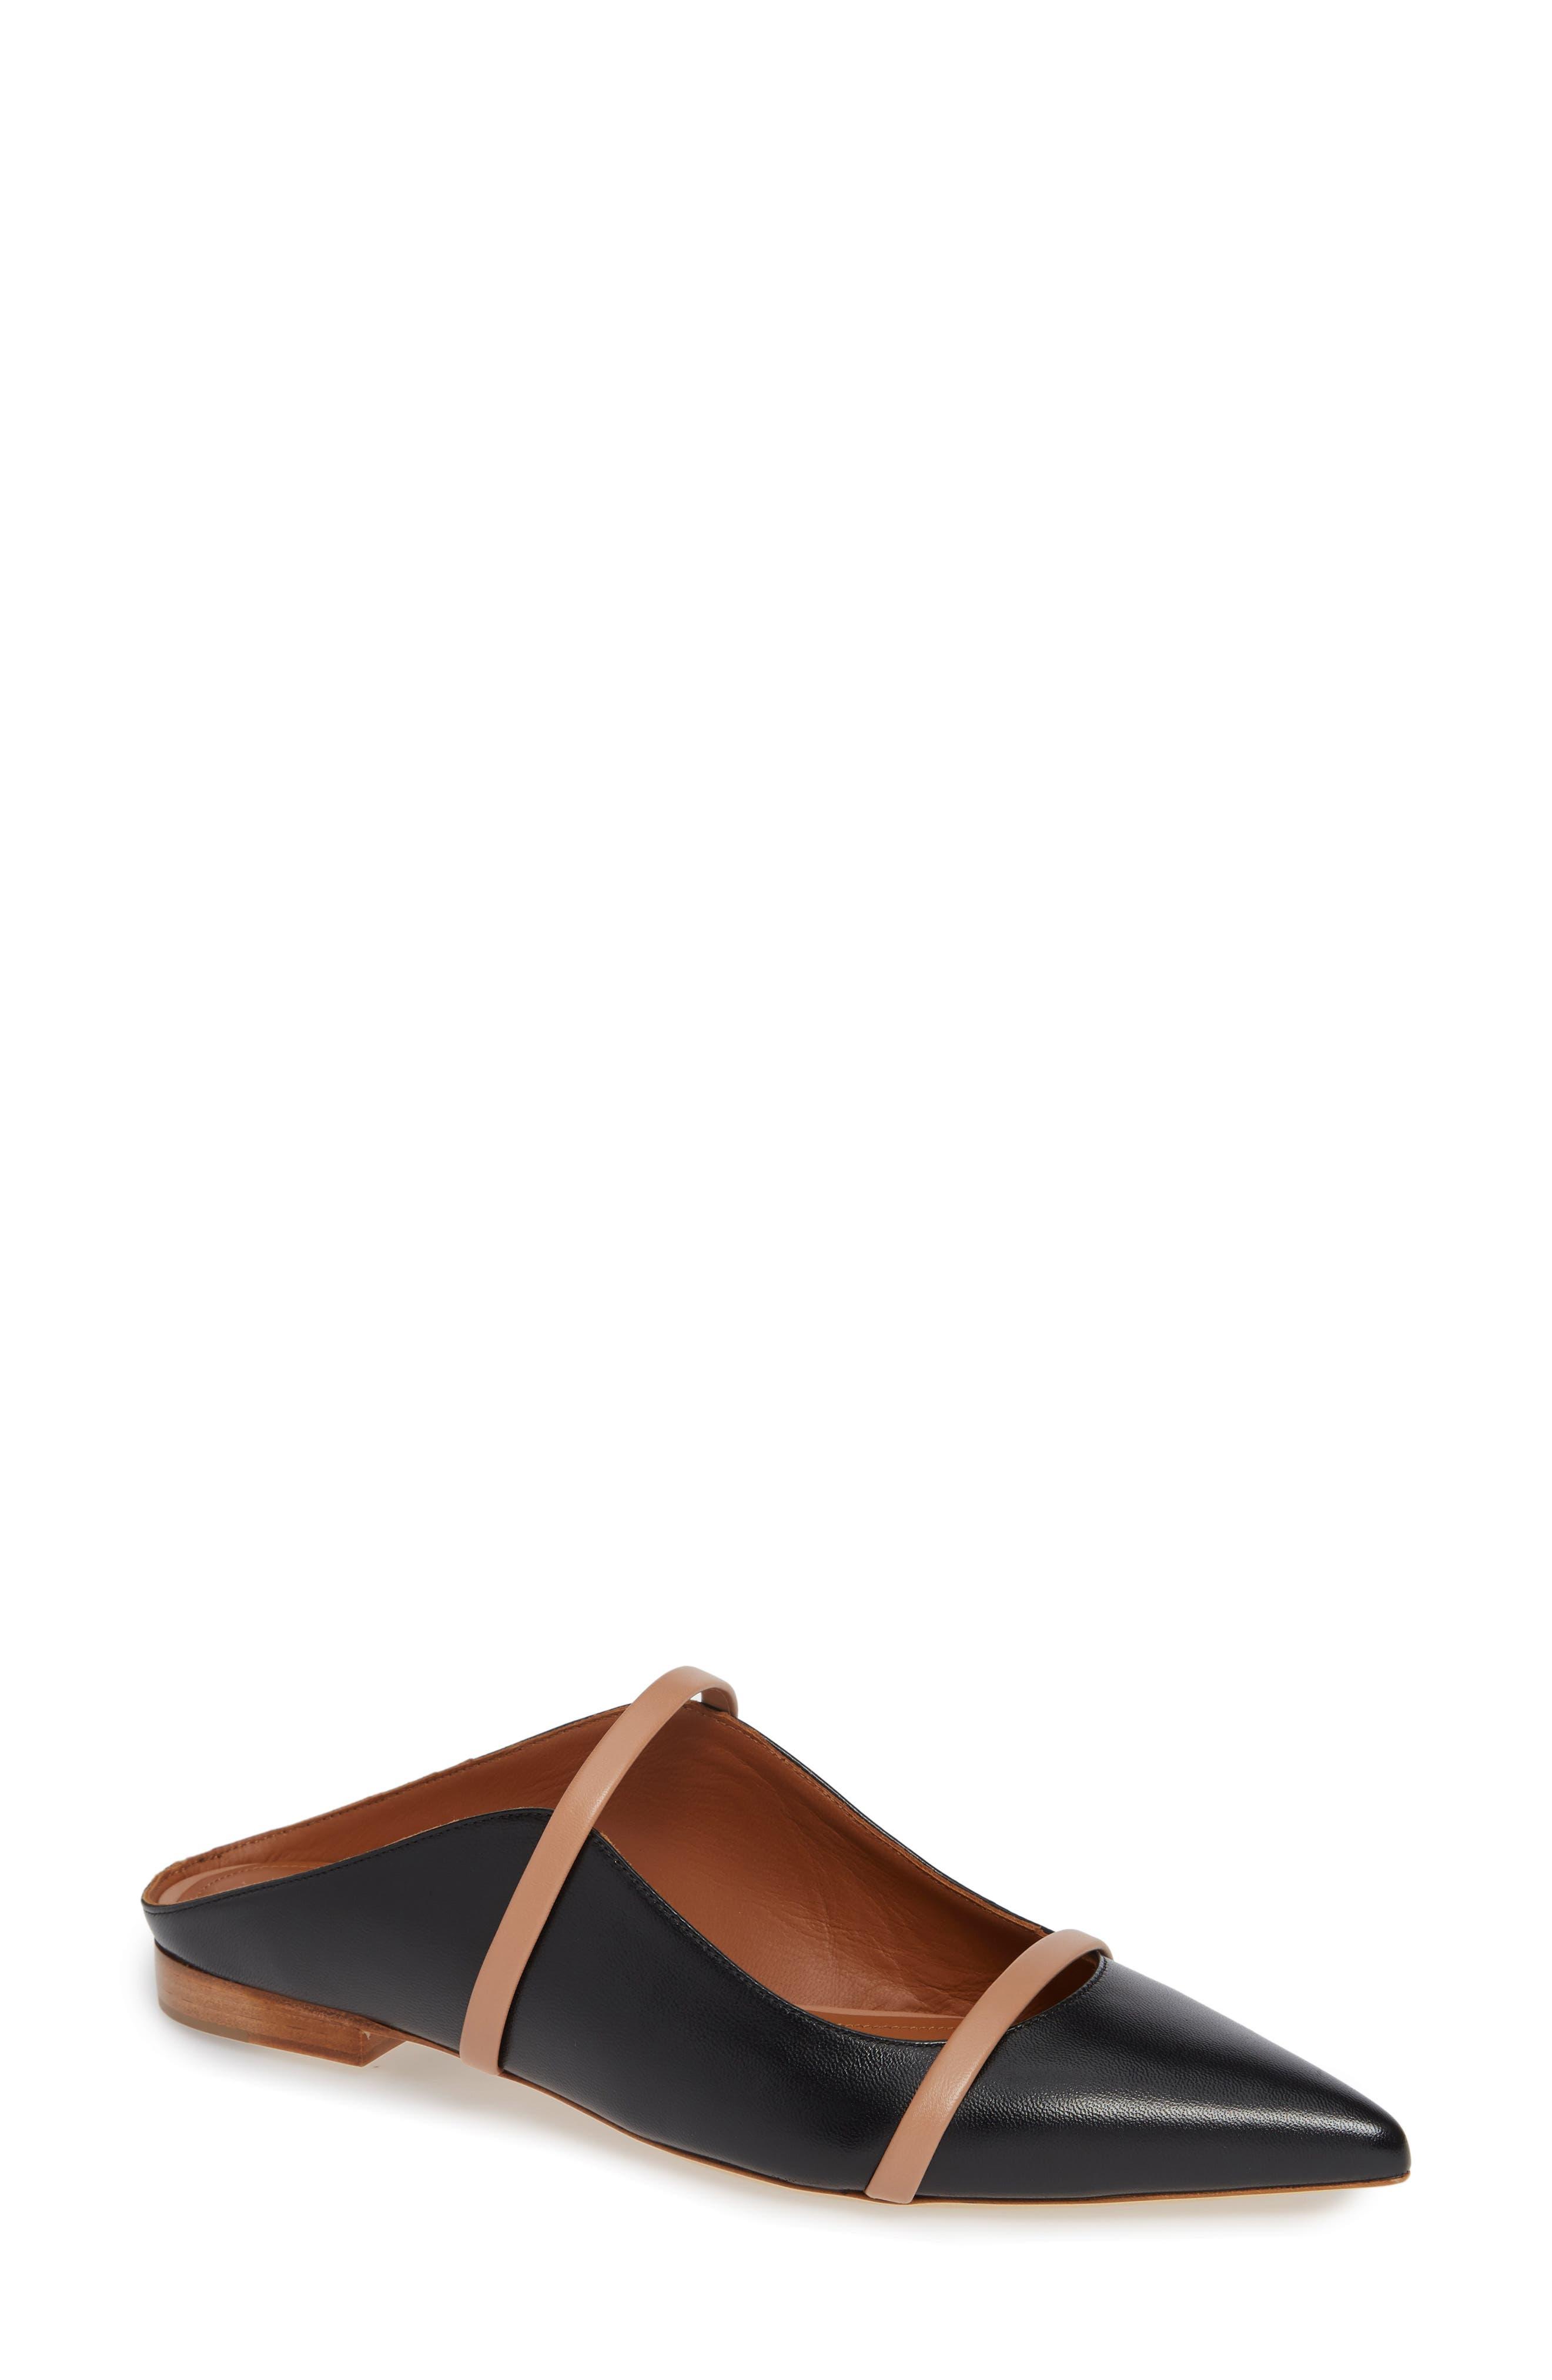 Maureen Pointy Toe Flat, Main, color, BLACK/ NUDE